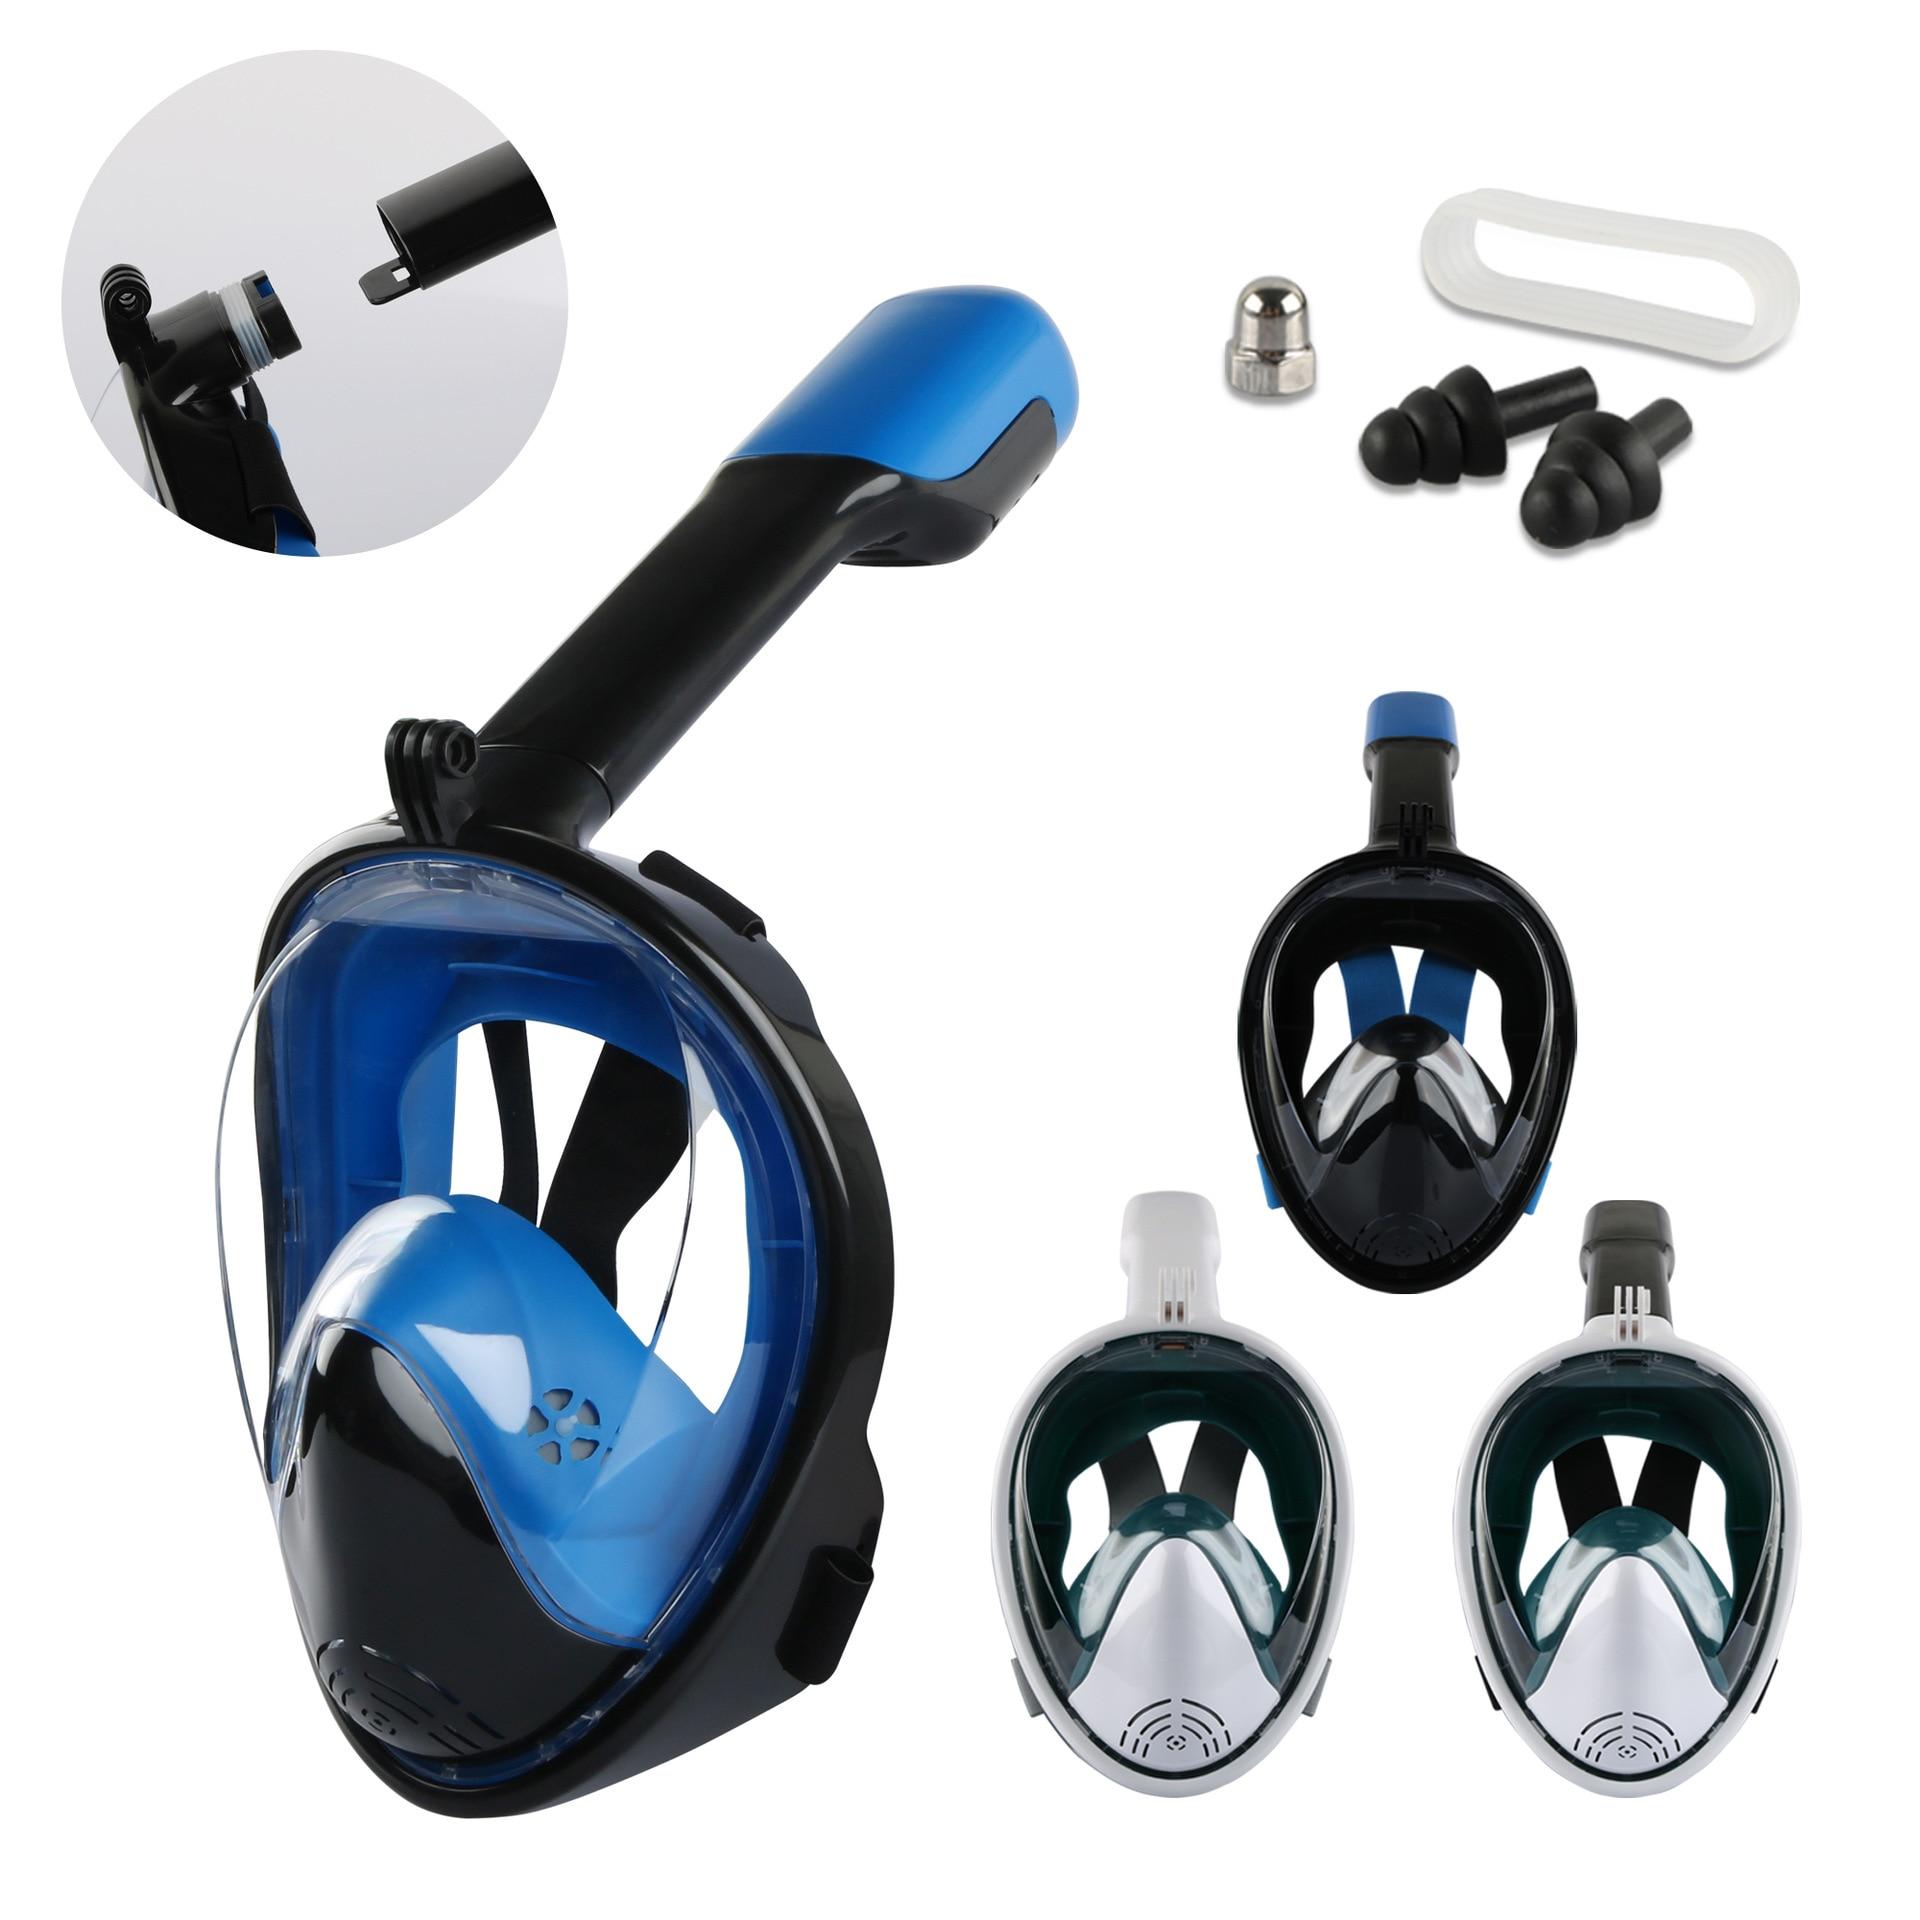 2019 New Underwater Diving Mask Scuba Mask Anti Fog Full Face Snorkeling Mask Adult Kids Swimming Snorkel Diving Equipment